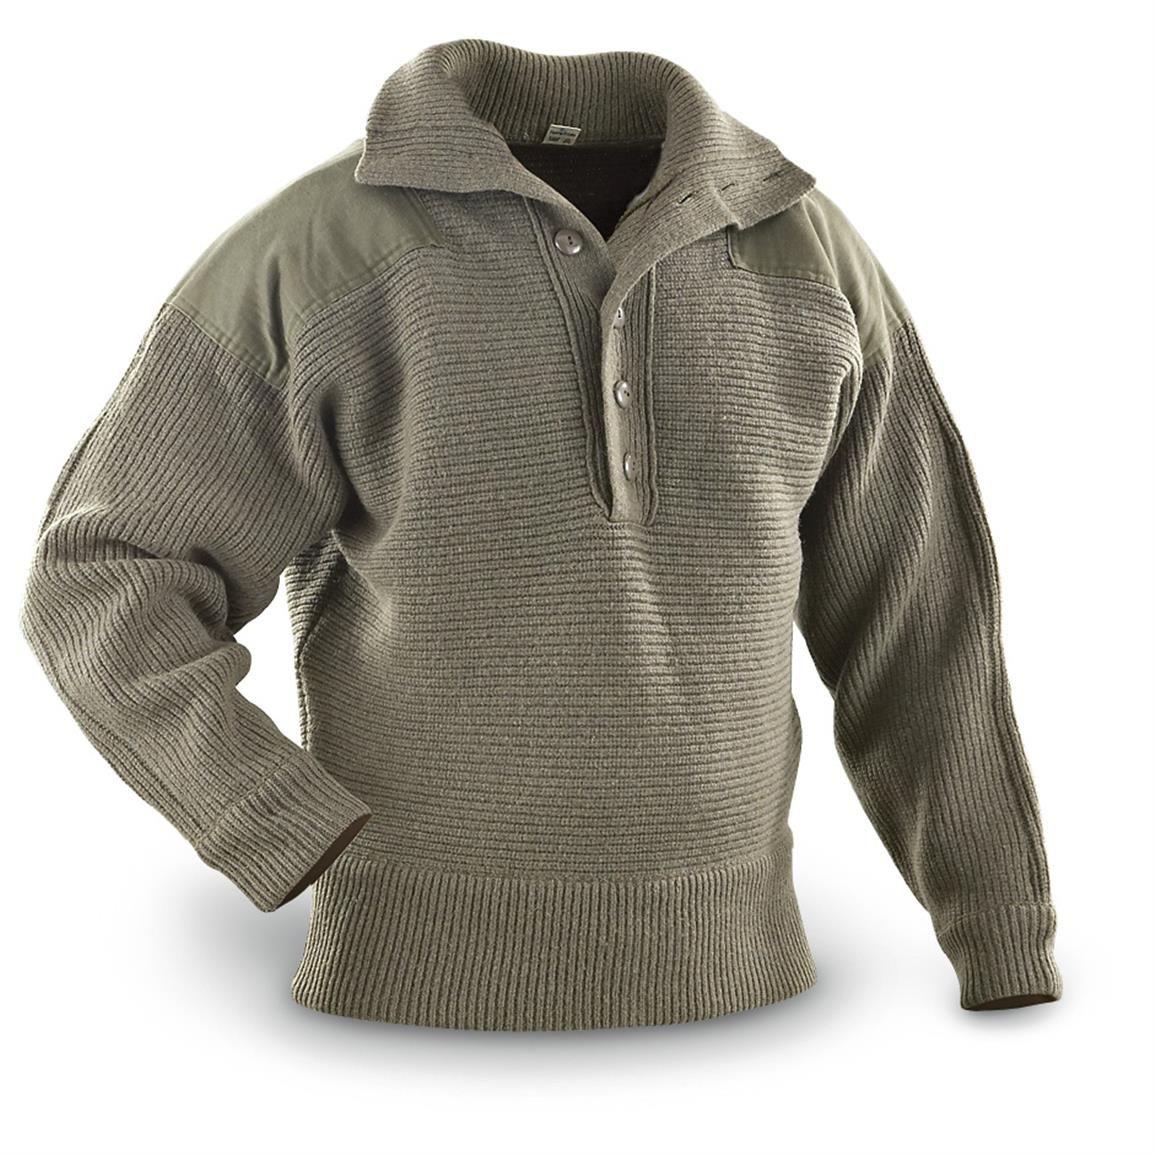 Used Austrian Surplus Heavy Duty Wool Sweater Olive Drab